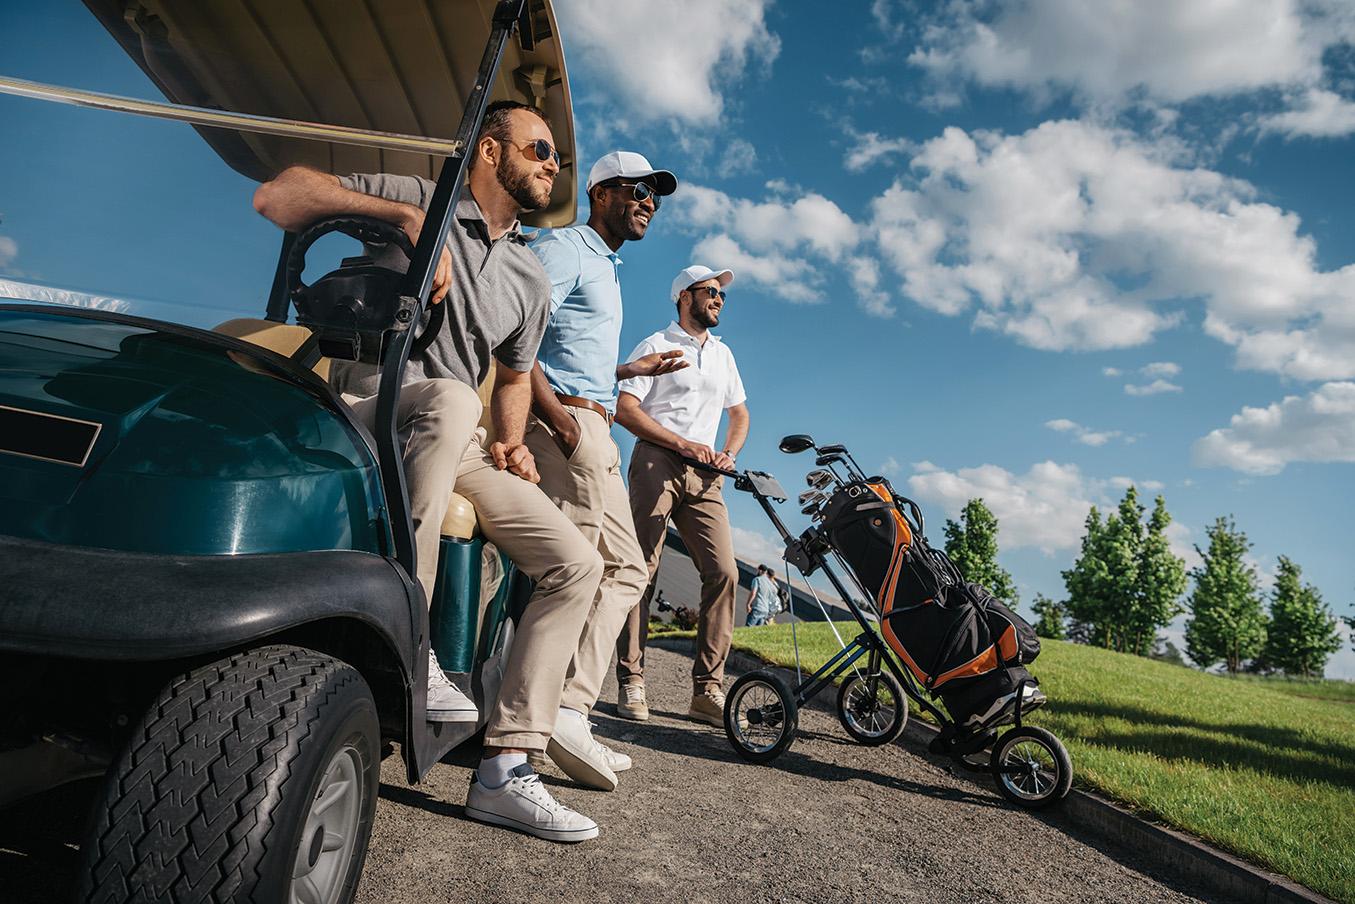 NZGM golfers